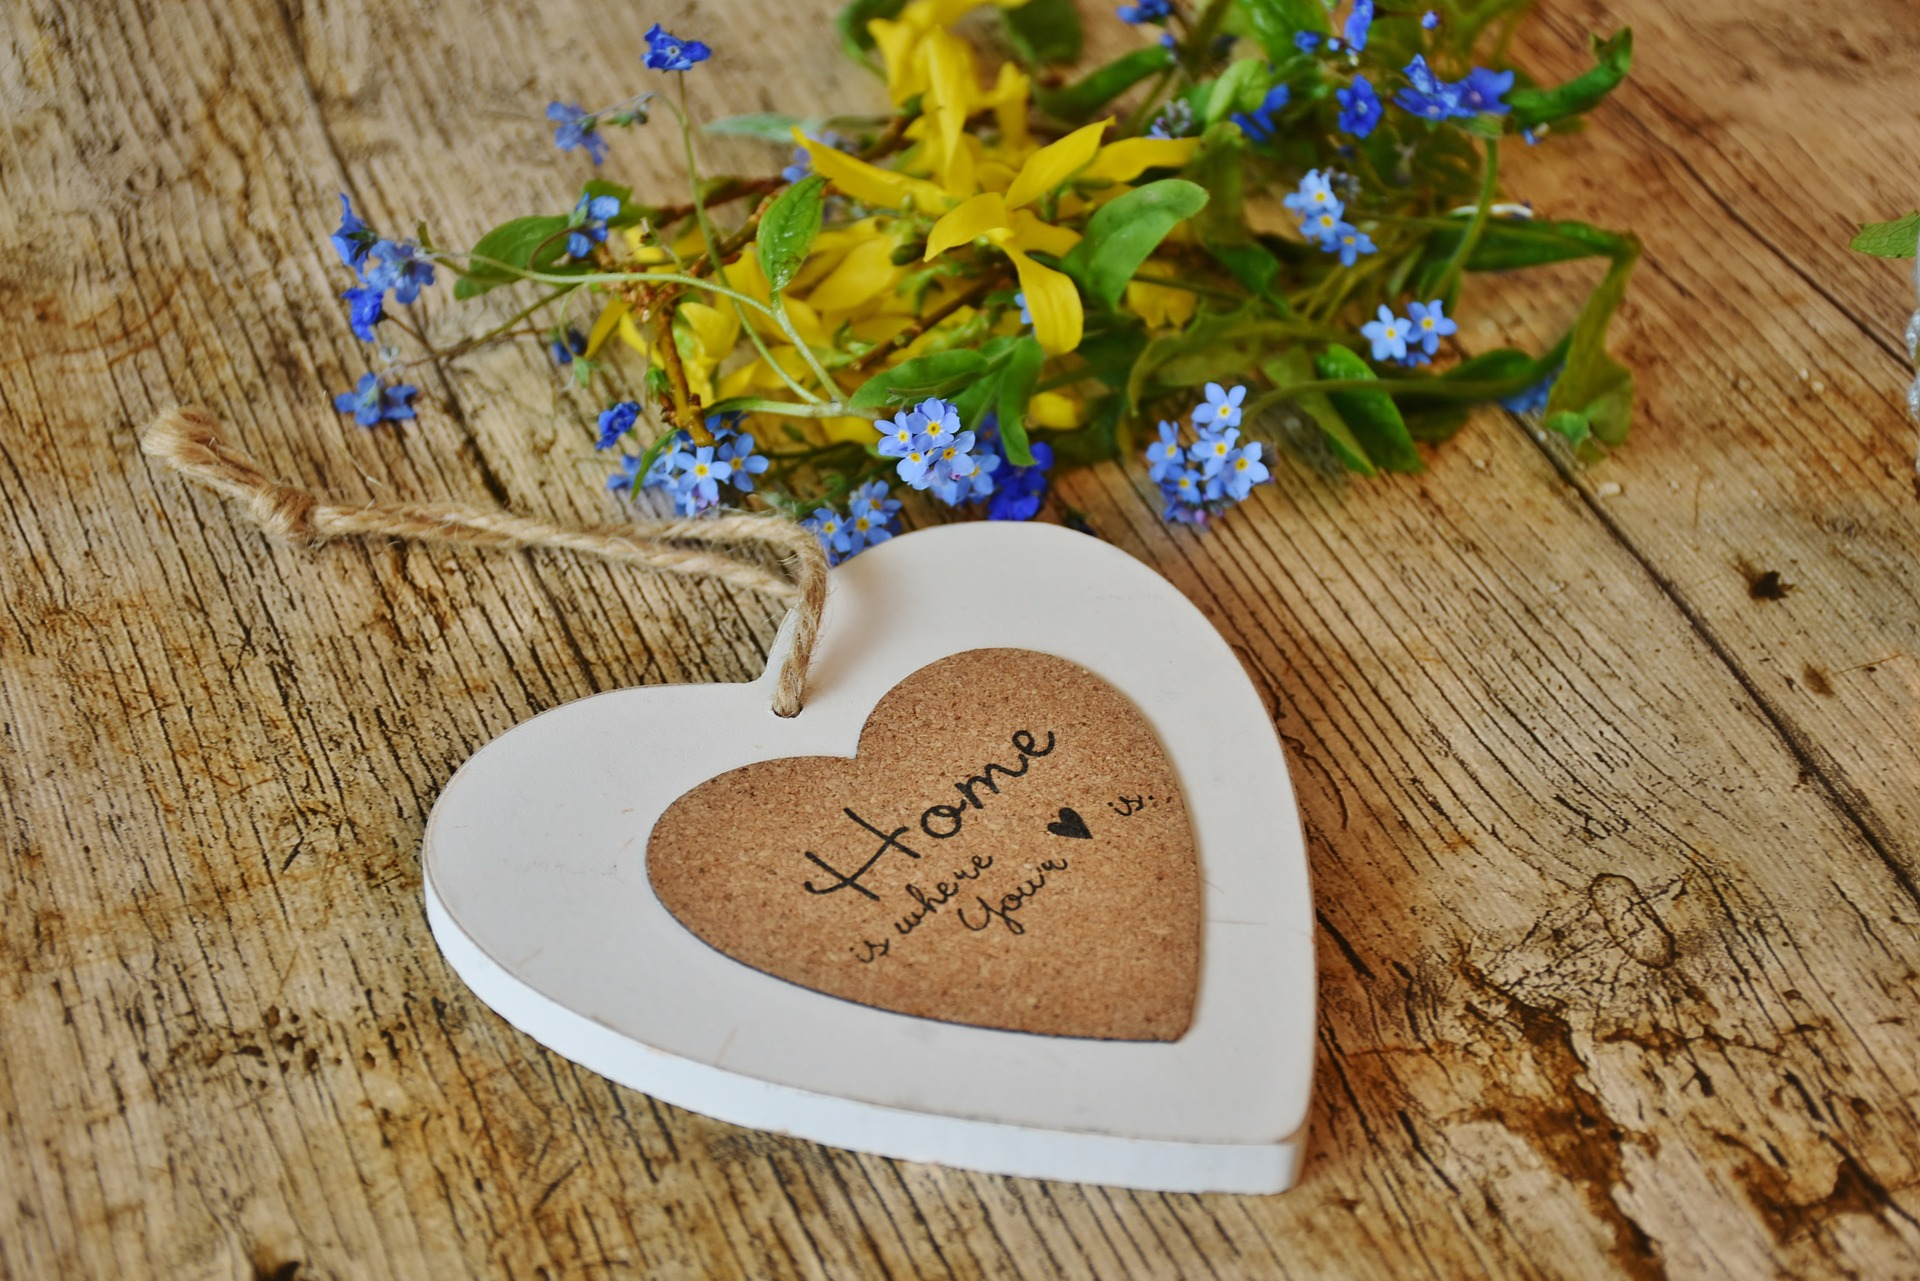 Verona recibe 1.000 tarjetas de San Valentín por la obra Romeo y Julieta